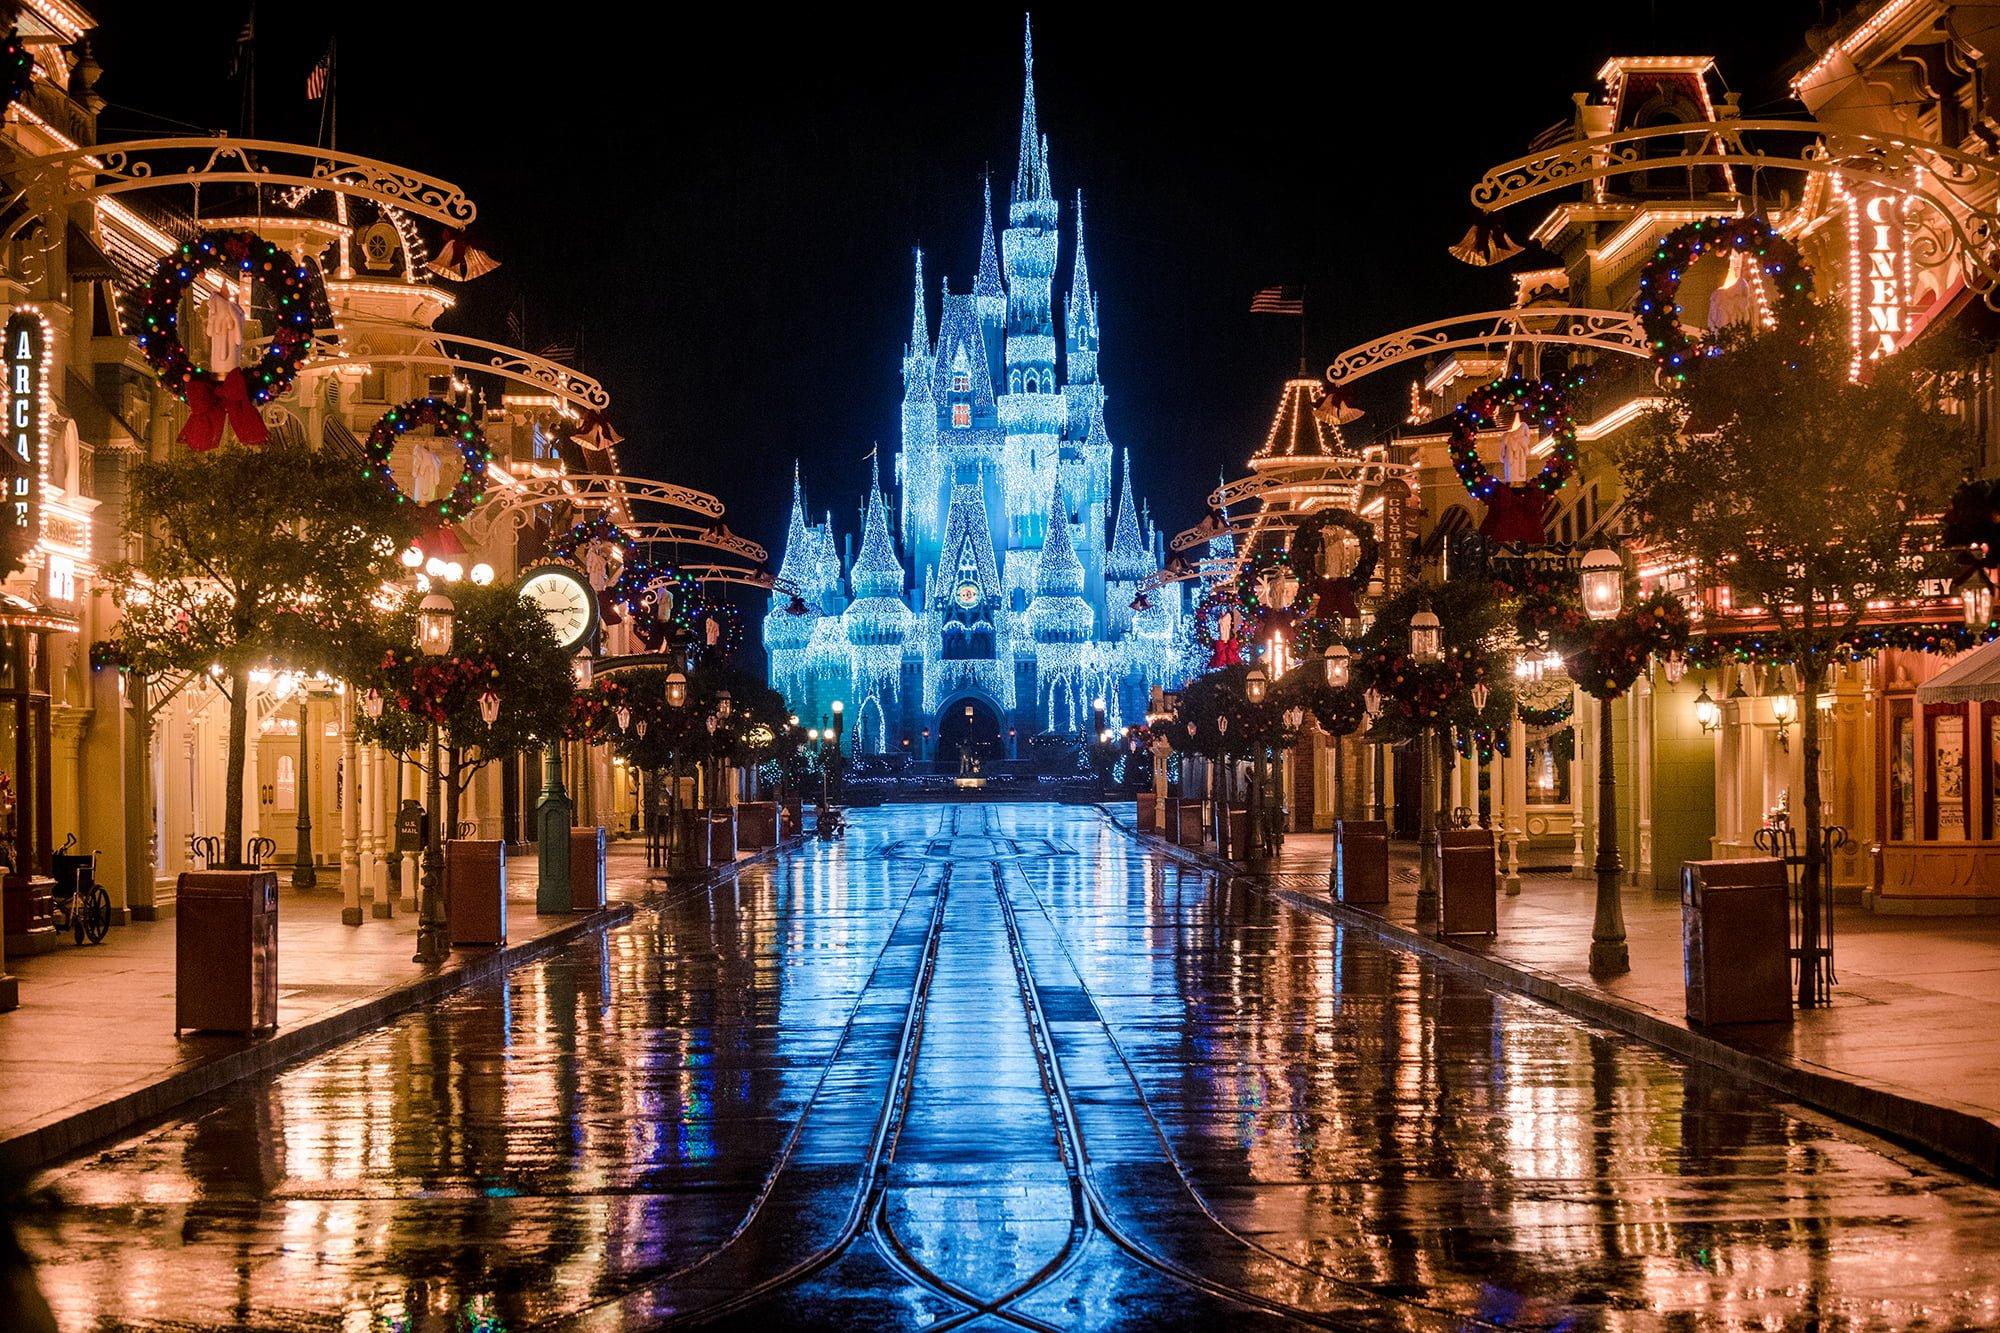 Ultimate 2017 Disney World Christmas Guide - Disney Tourist Blog